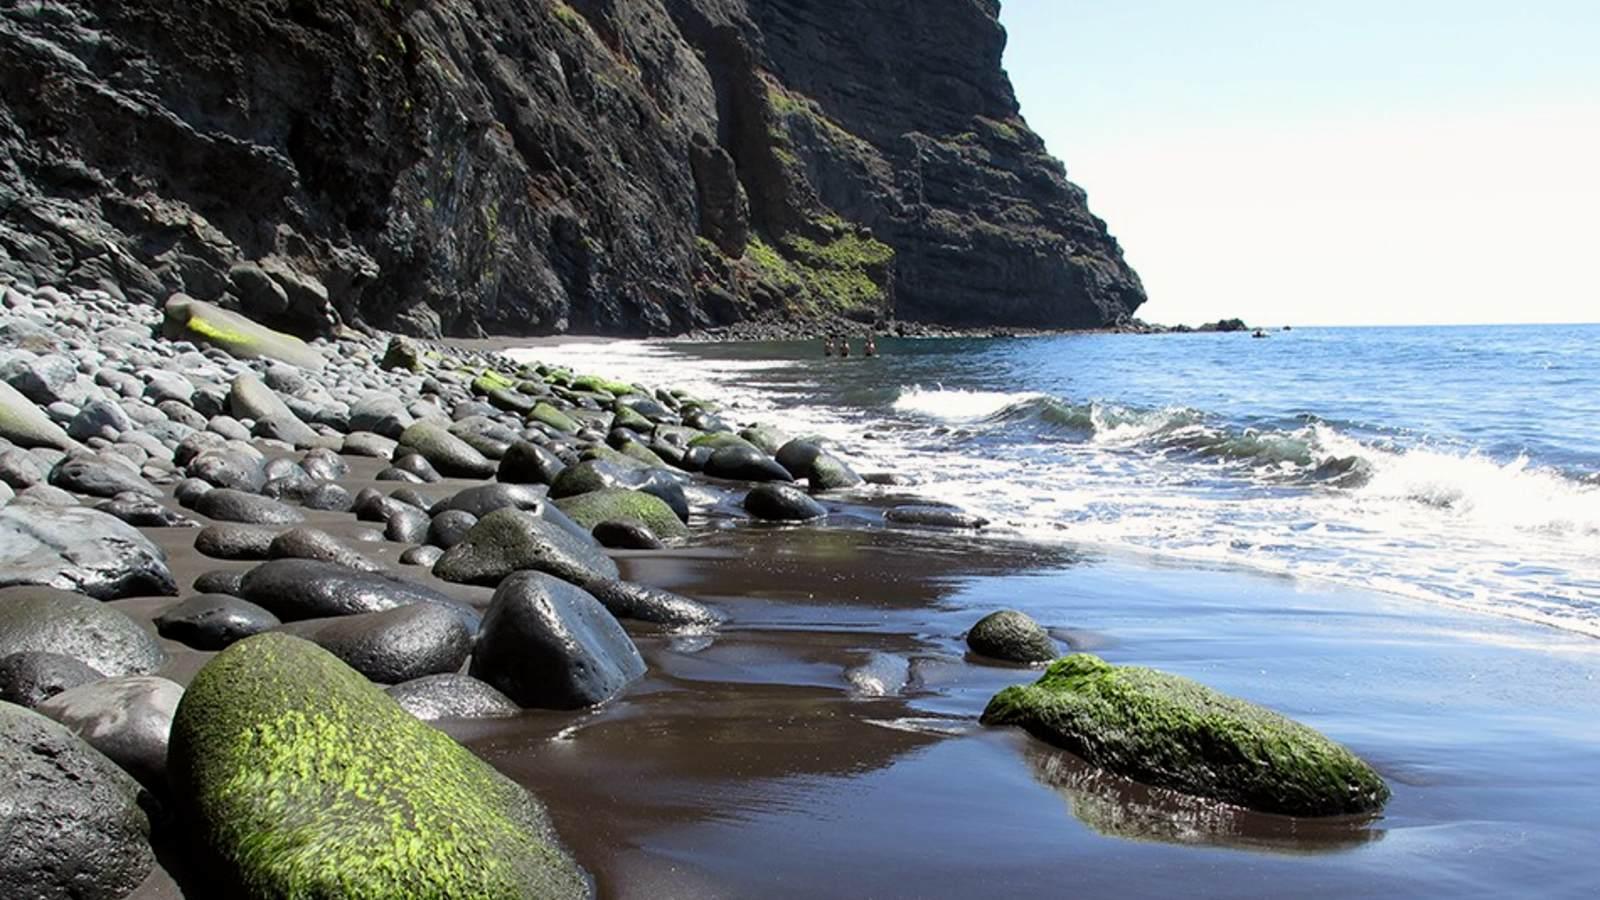 Playa rocosa al final del Barranco de Masca